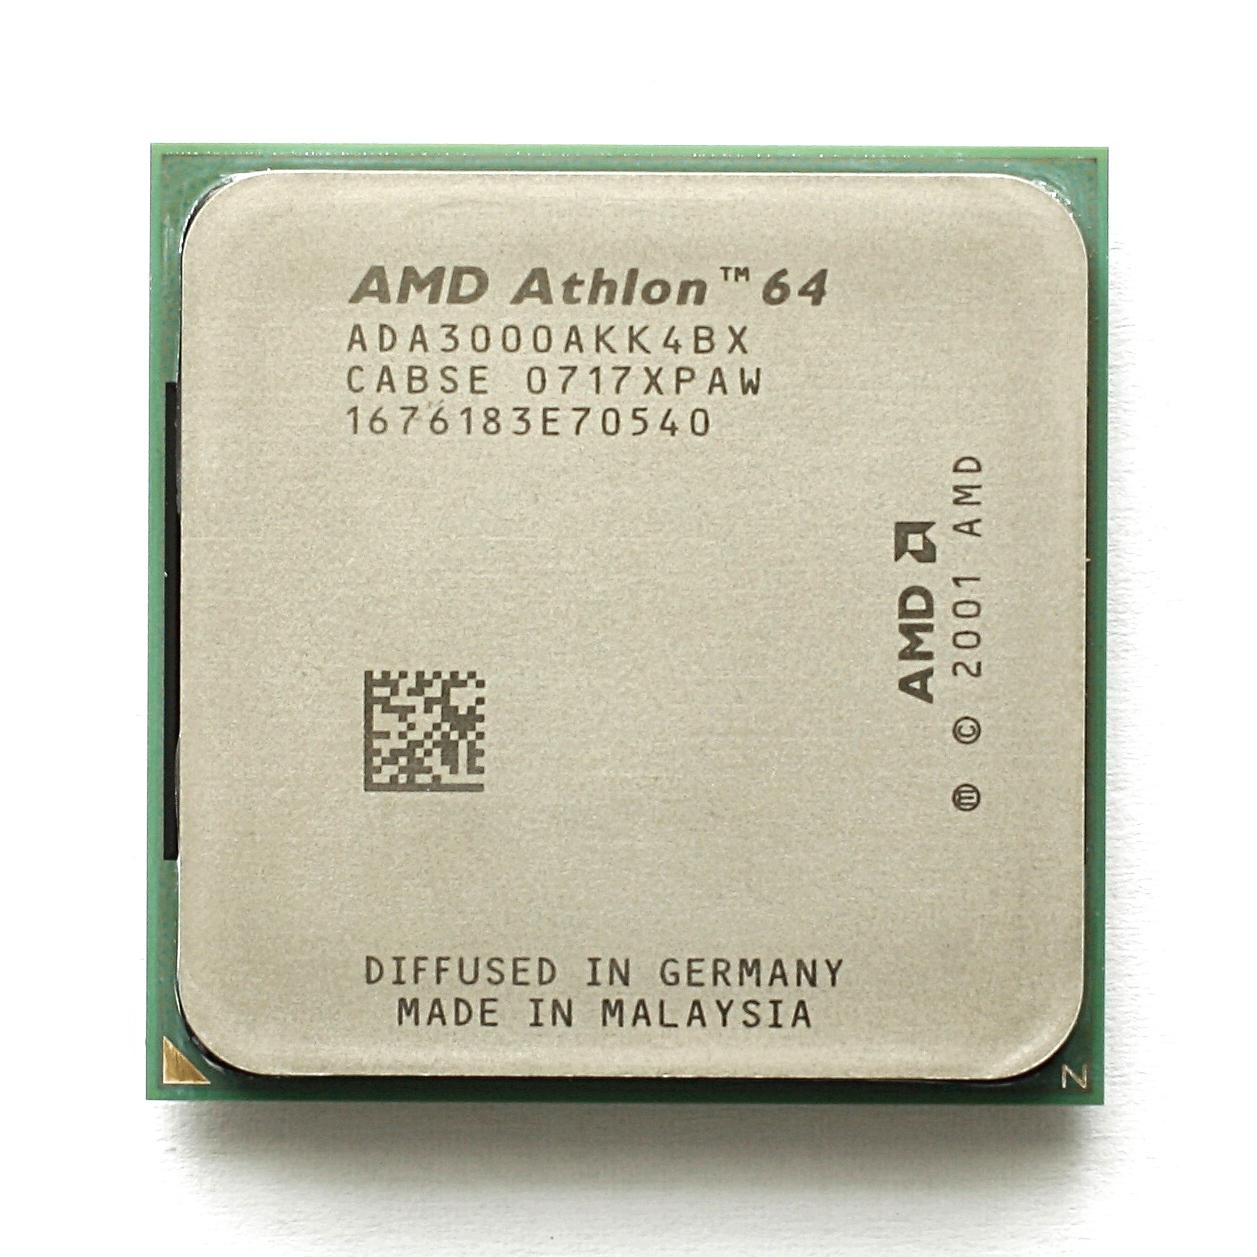 AMD ATHLON64 WINDOWS 8.1 DRIVERS DOWNLOAD